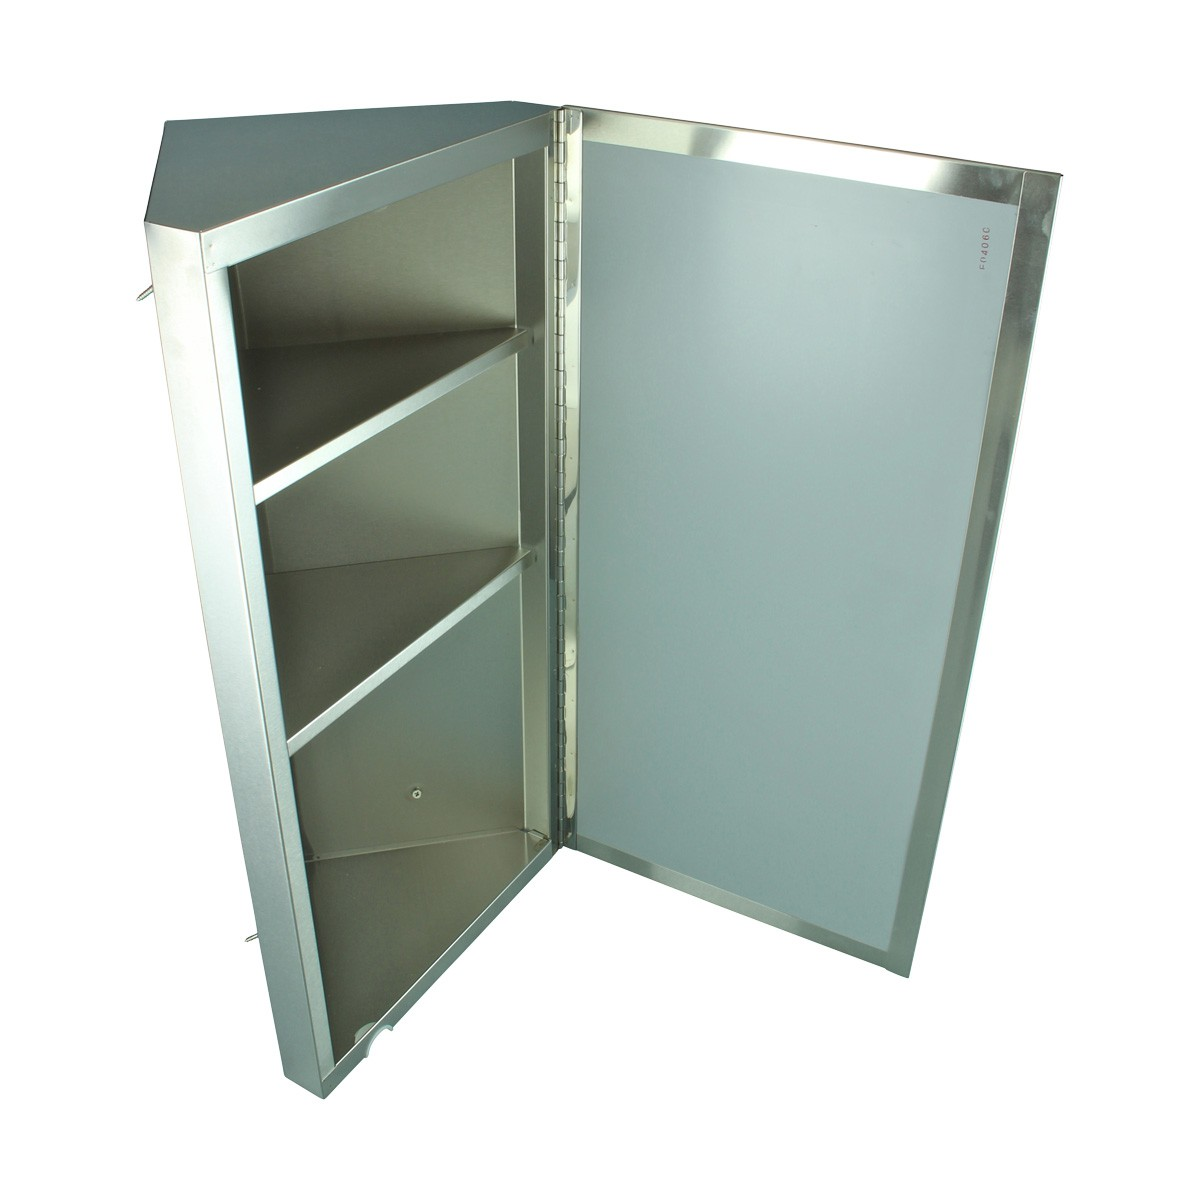 Renovators Supply Brushed Stainless Steel Wall Mount Corner Medicine Cabinet Mirrored Medicine Cabinet Medicine Cabinet Organizer Medicine Cabinet Shelf